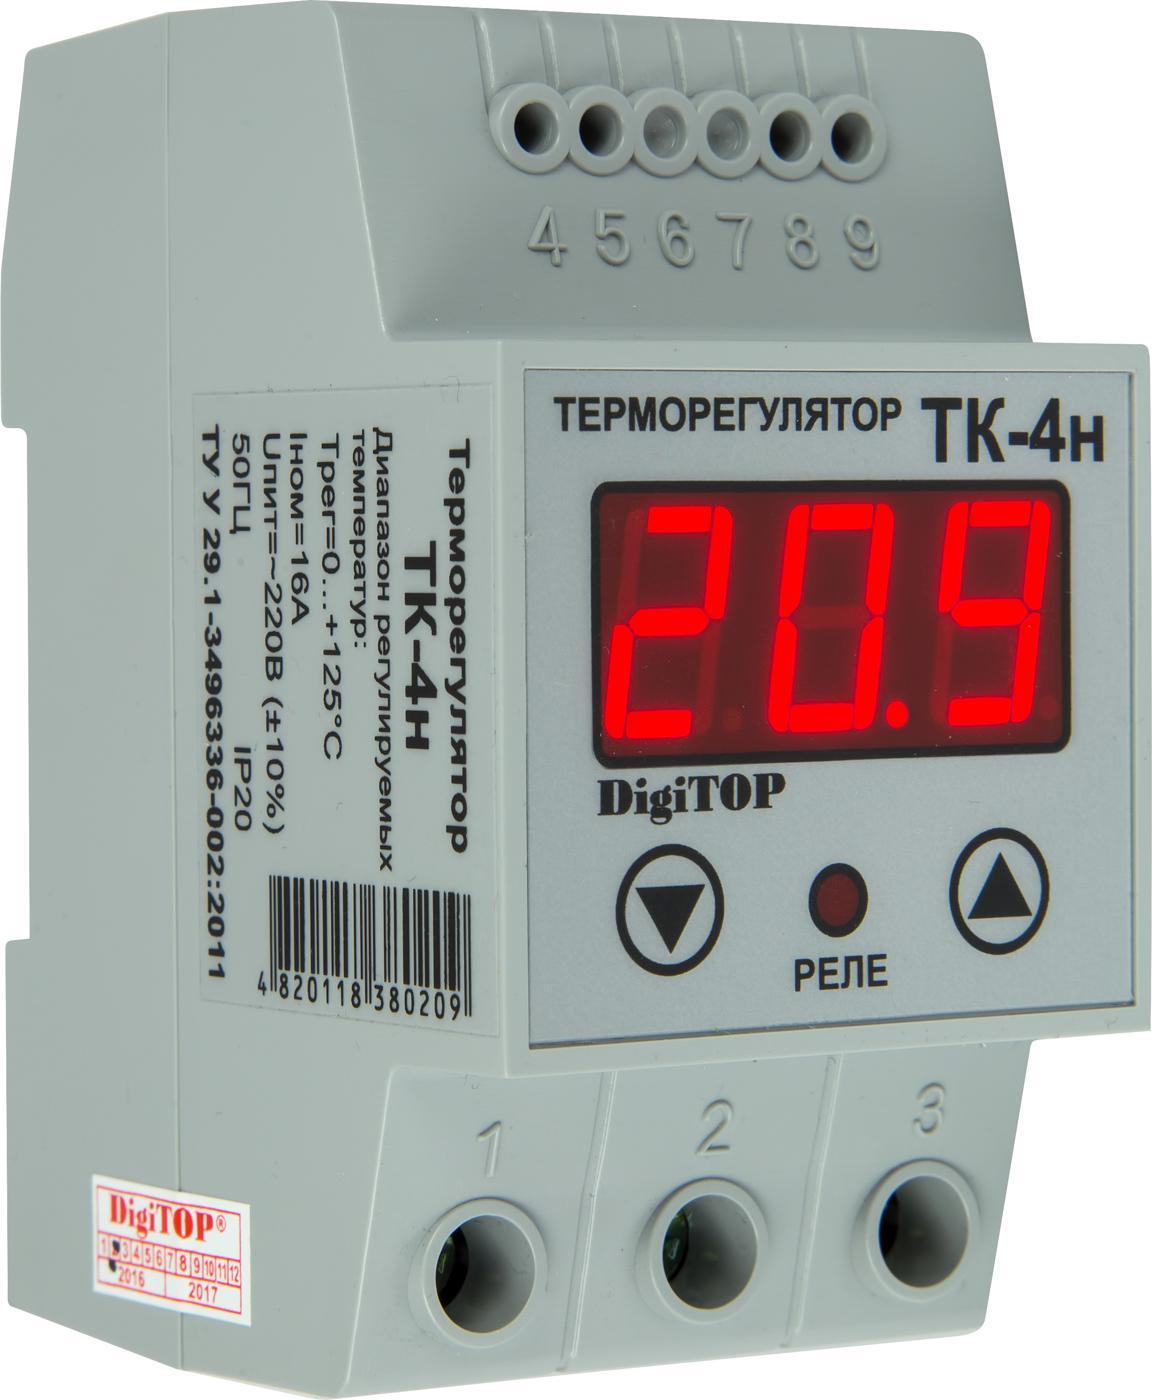 Терморегулятор Digitop ТК-4н цена и фото